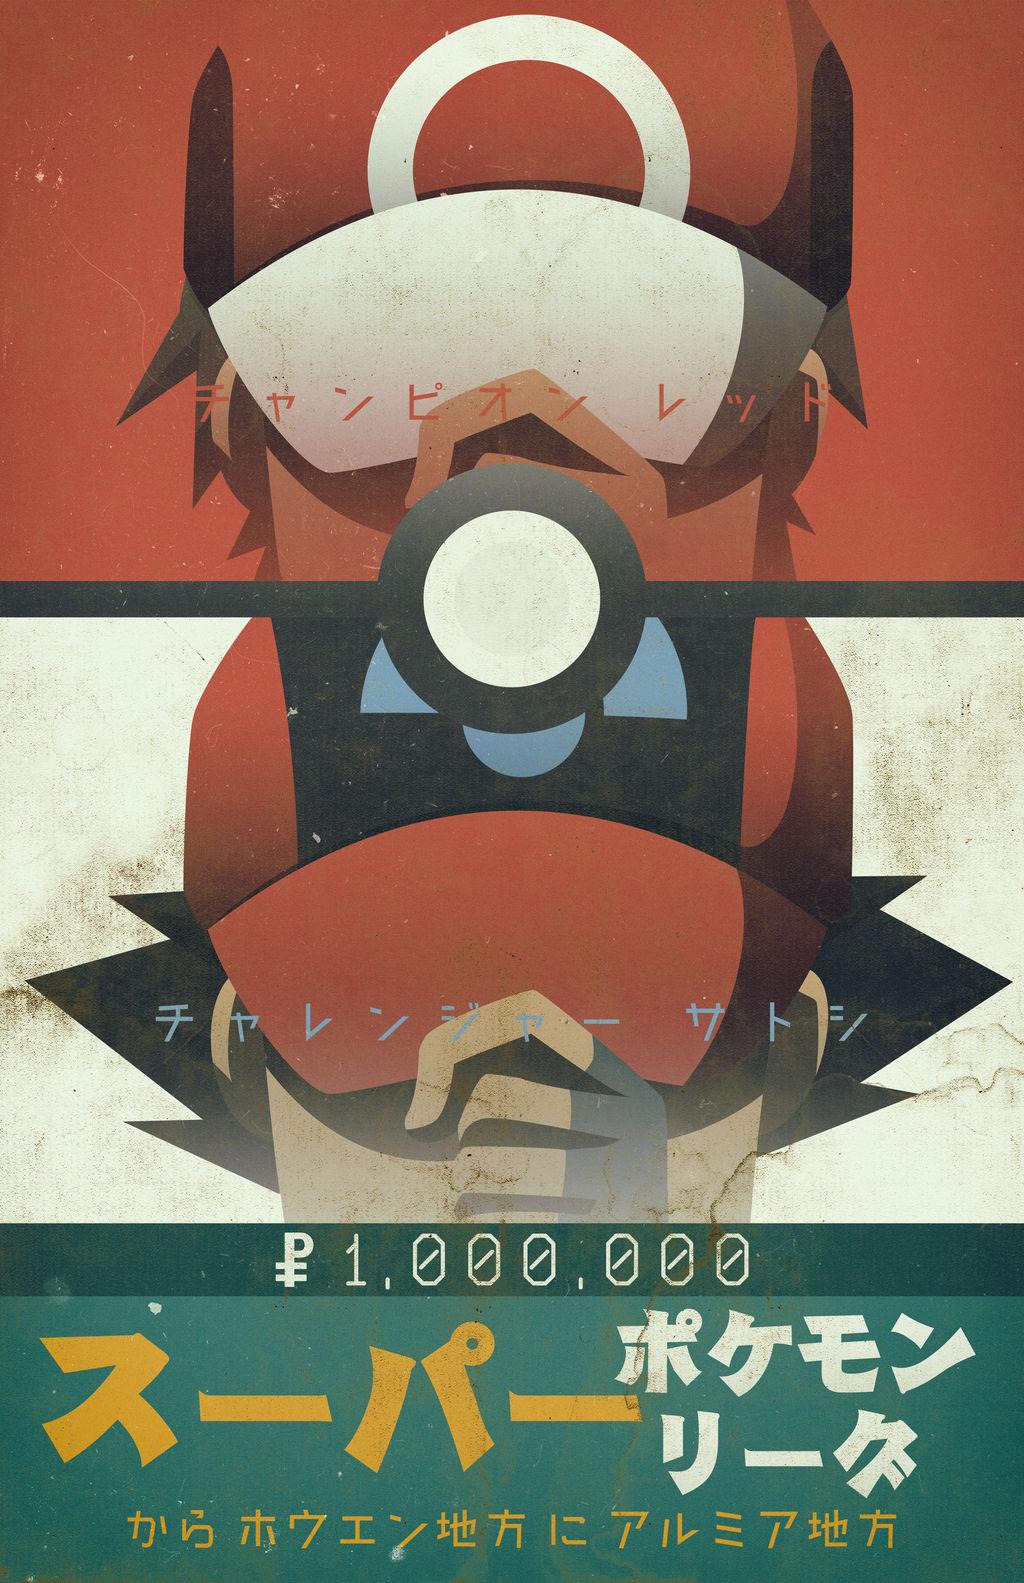 Red vs Ash | Pokemon [Poster] by PlushGiant